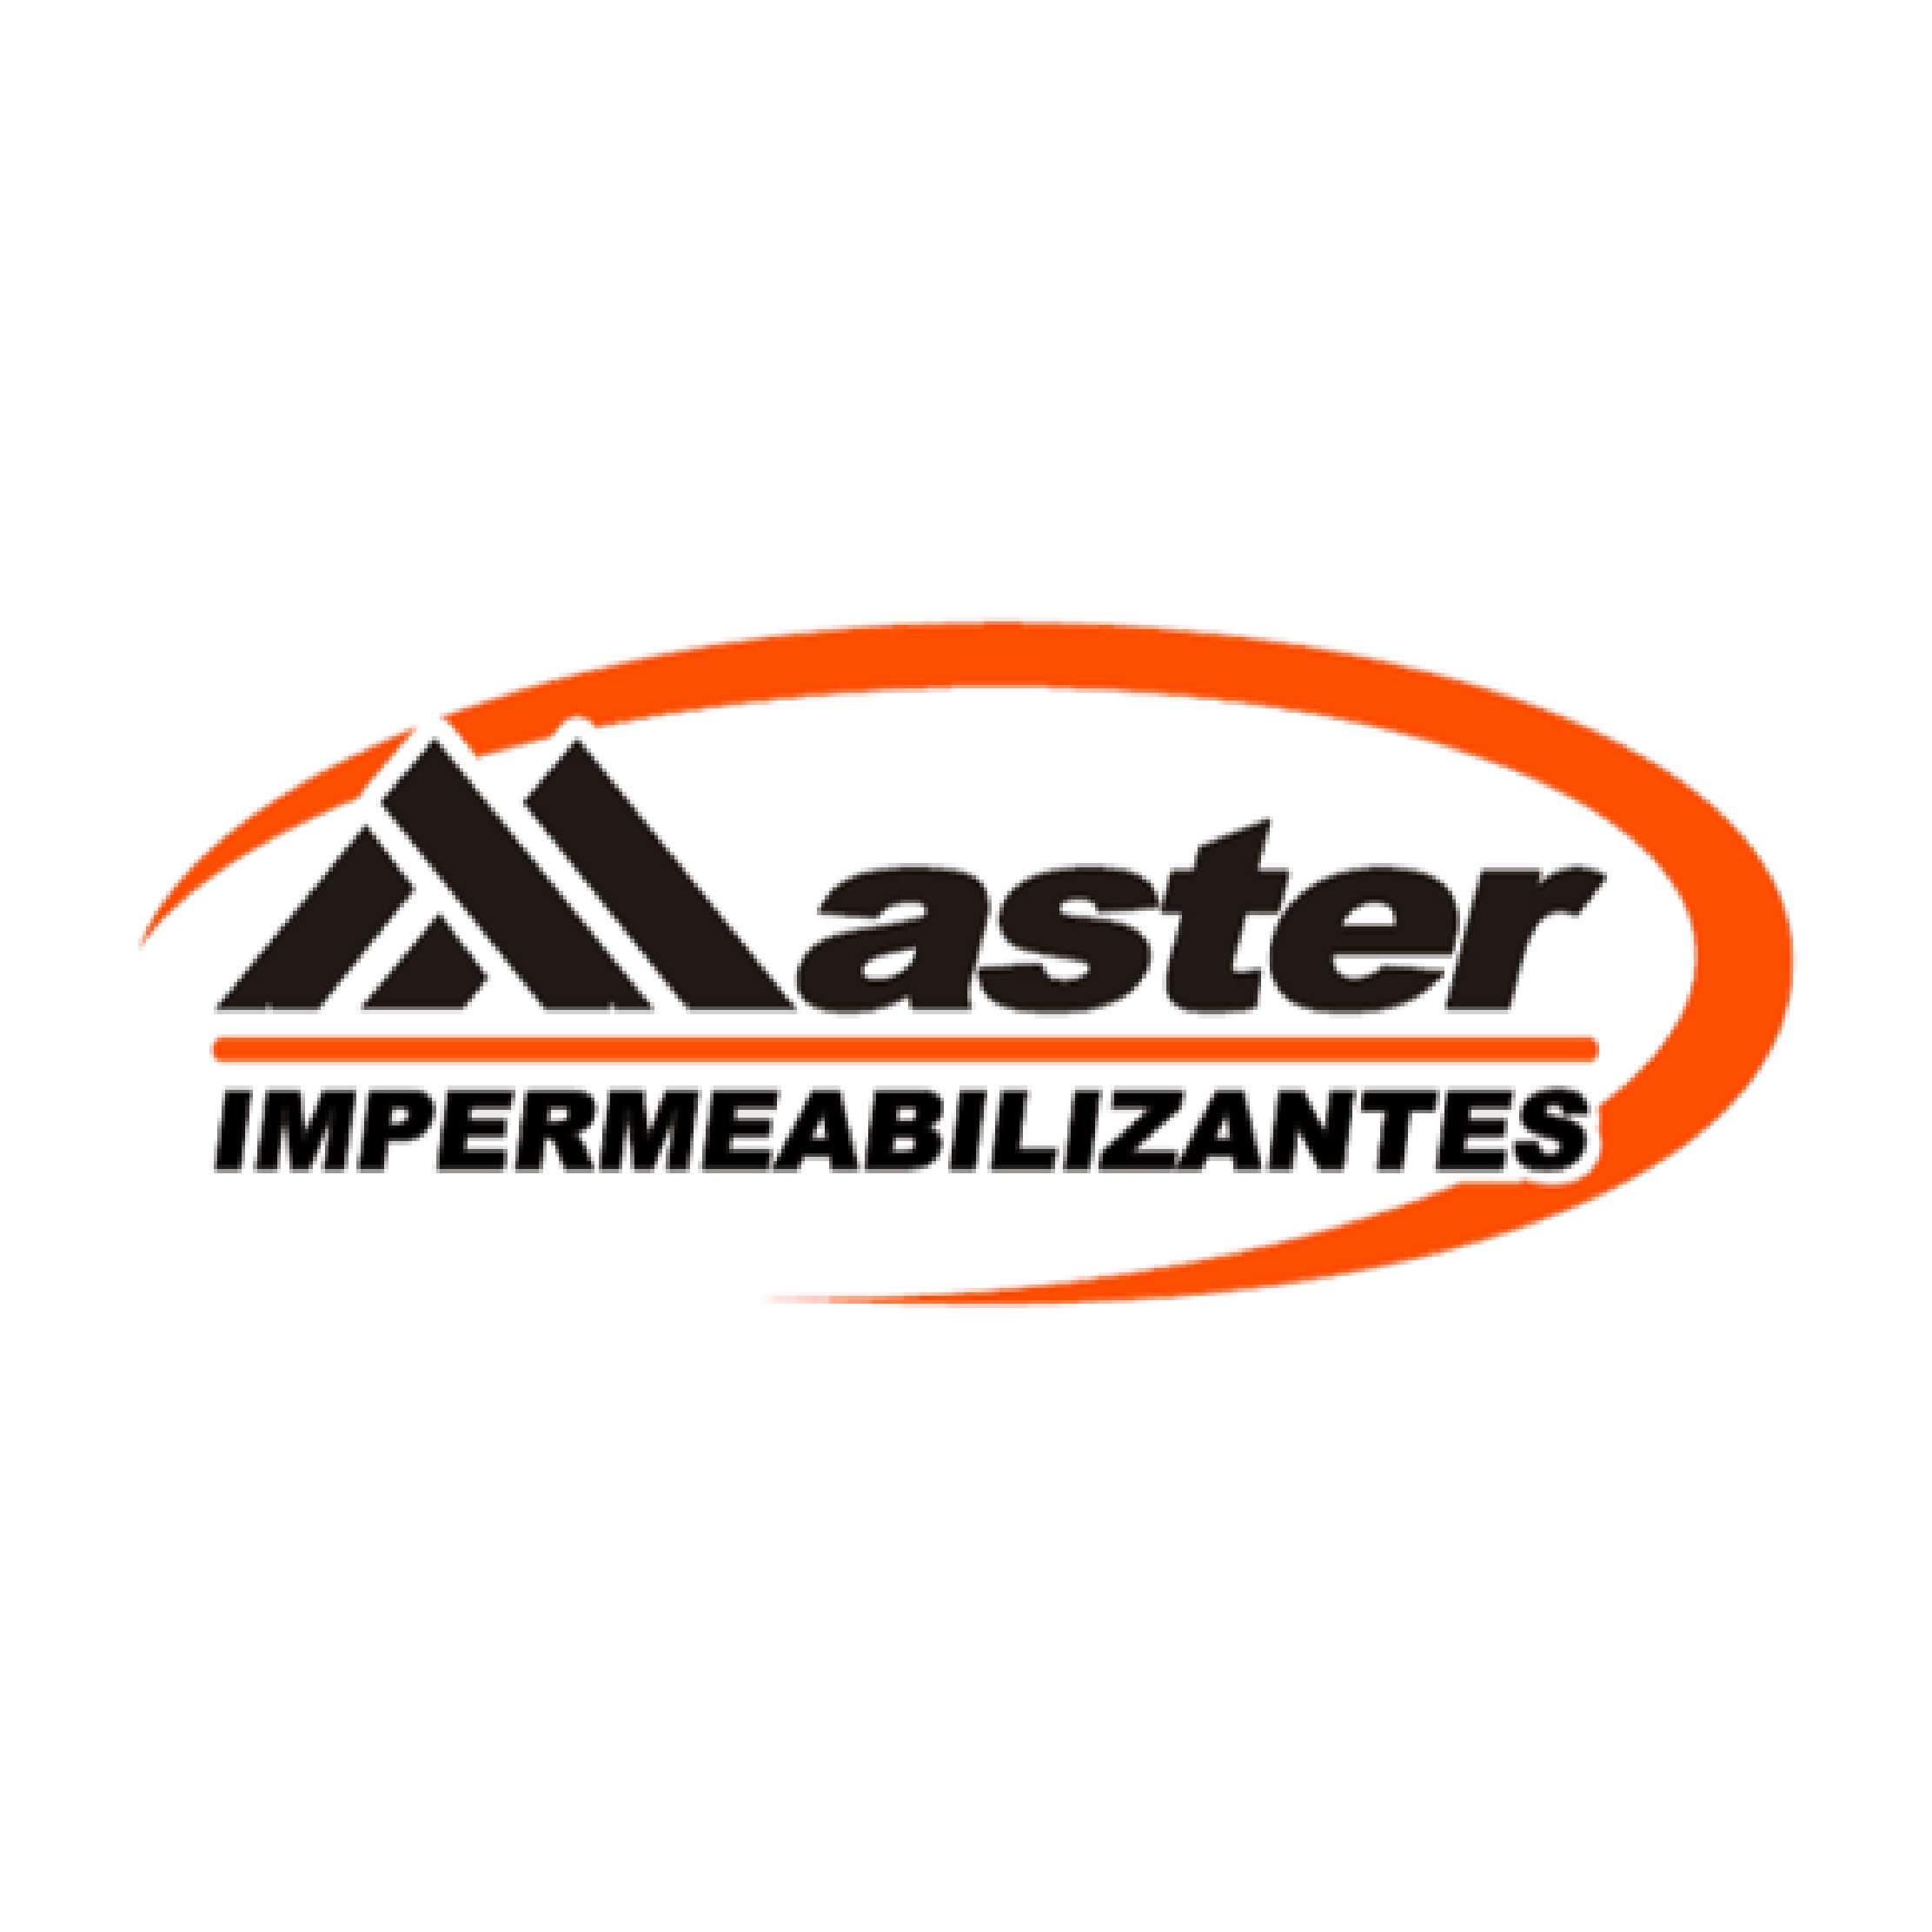 Master Impermeabilizantes